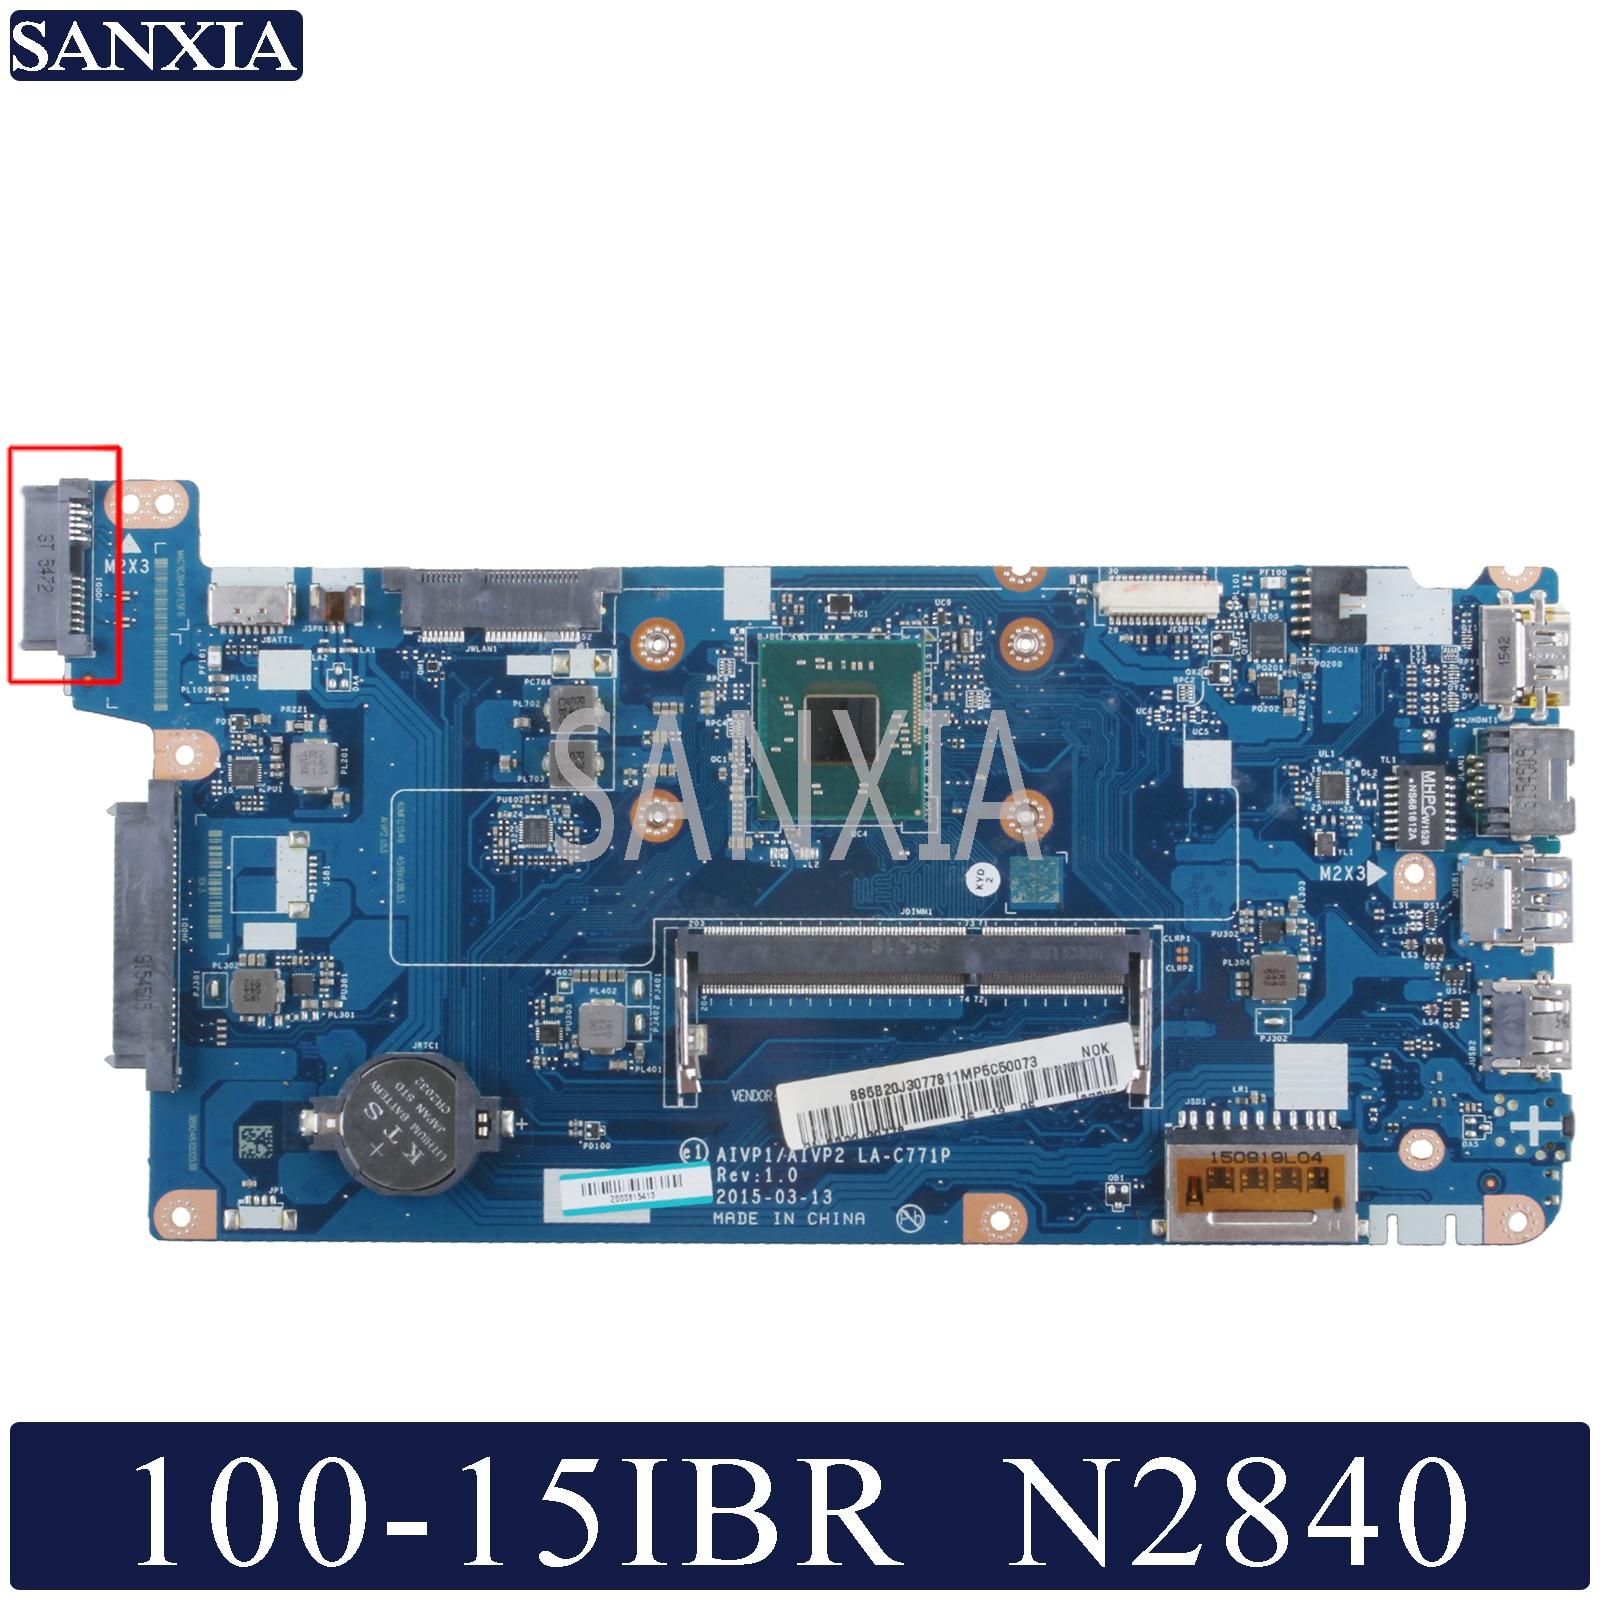 KEFU LA-C771P Laptop Motherboard For Lenovo Ideapad 100-15IBR Original Mainboard N2840/2830 CPU